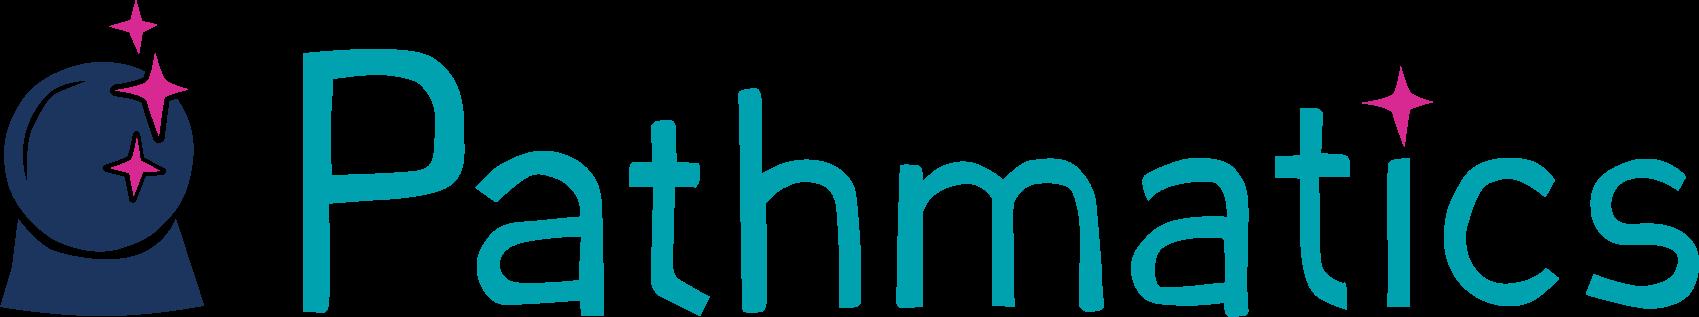 Pathmatics logo